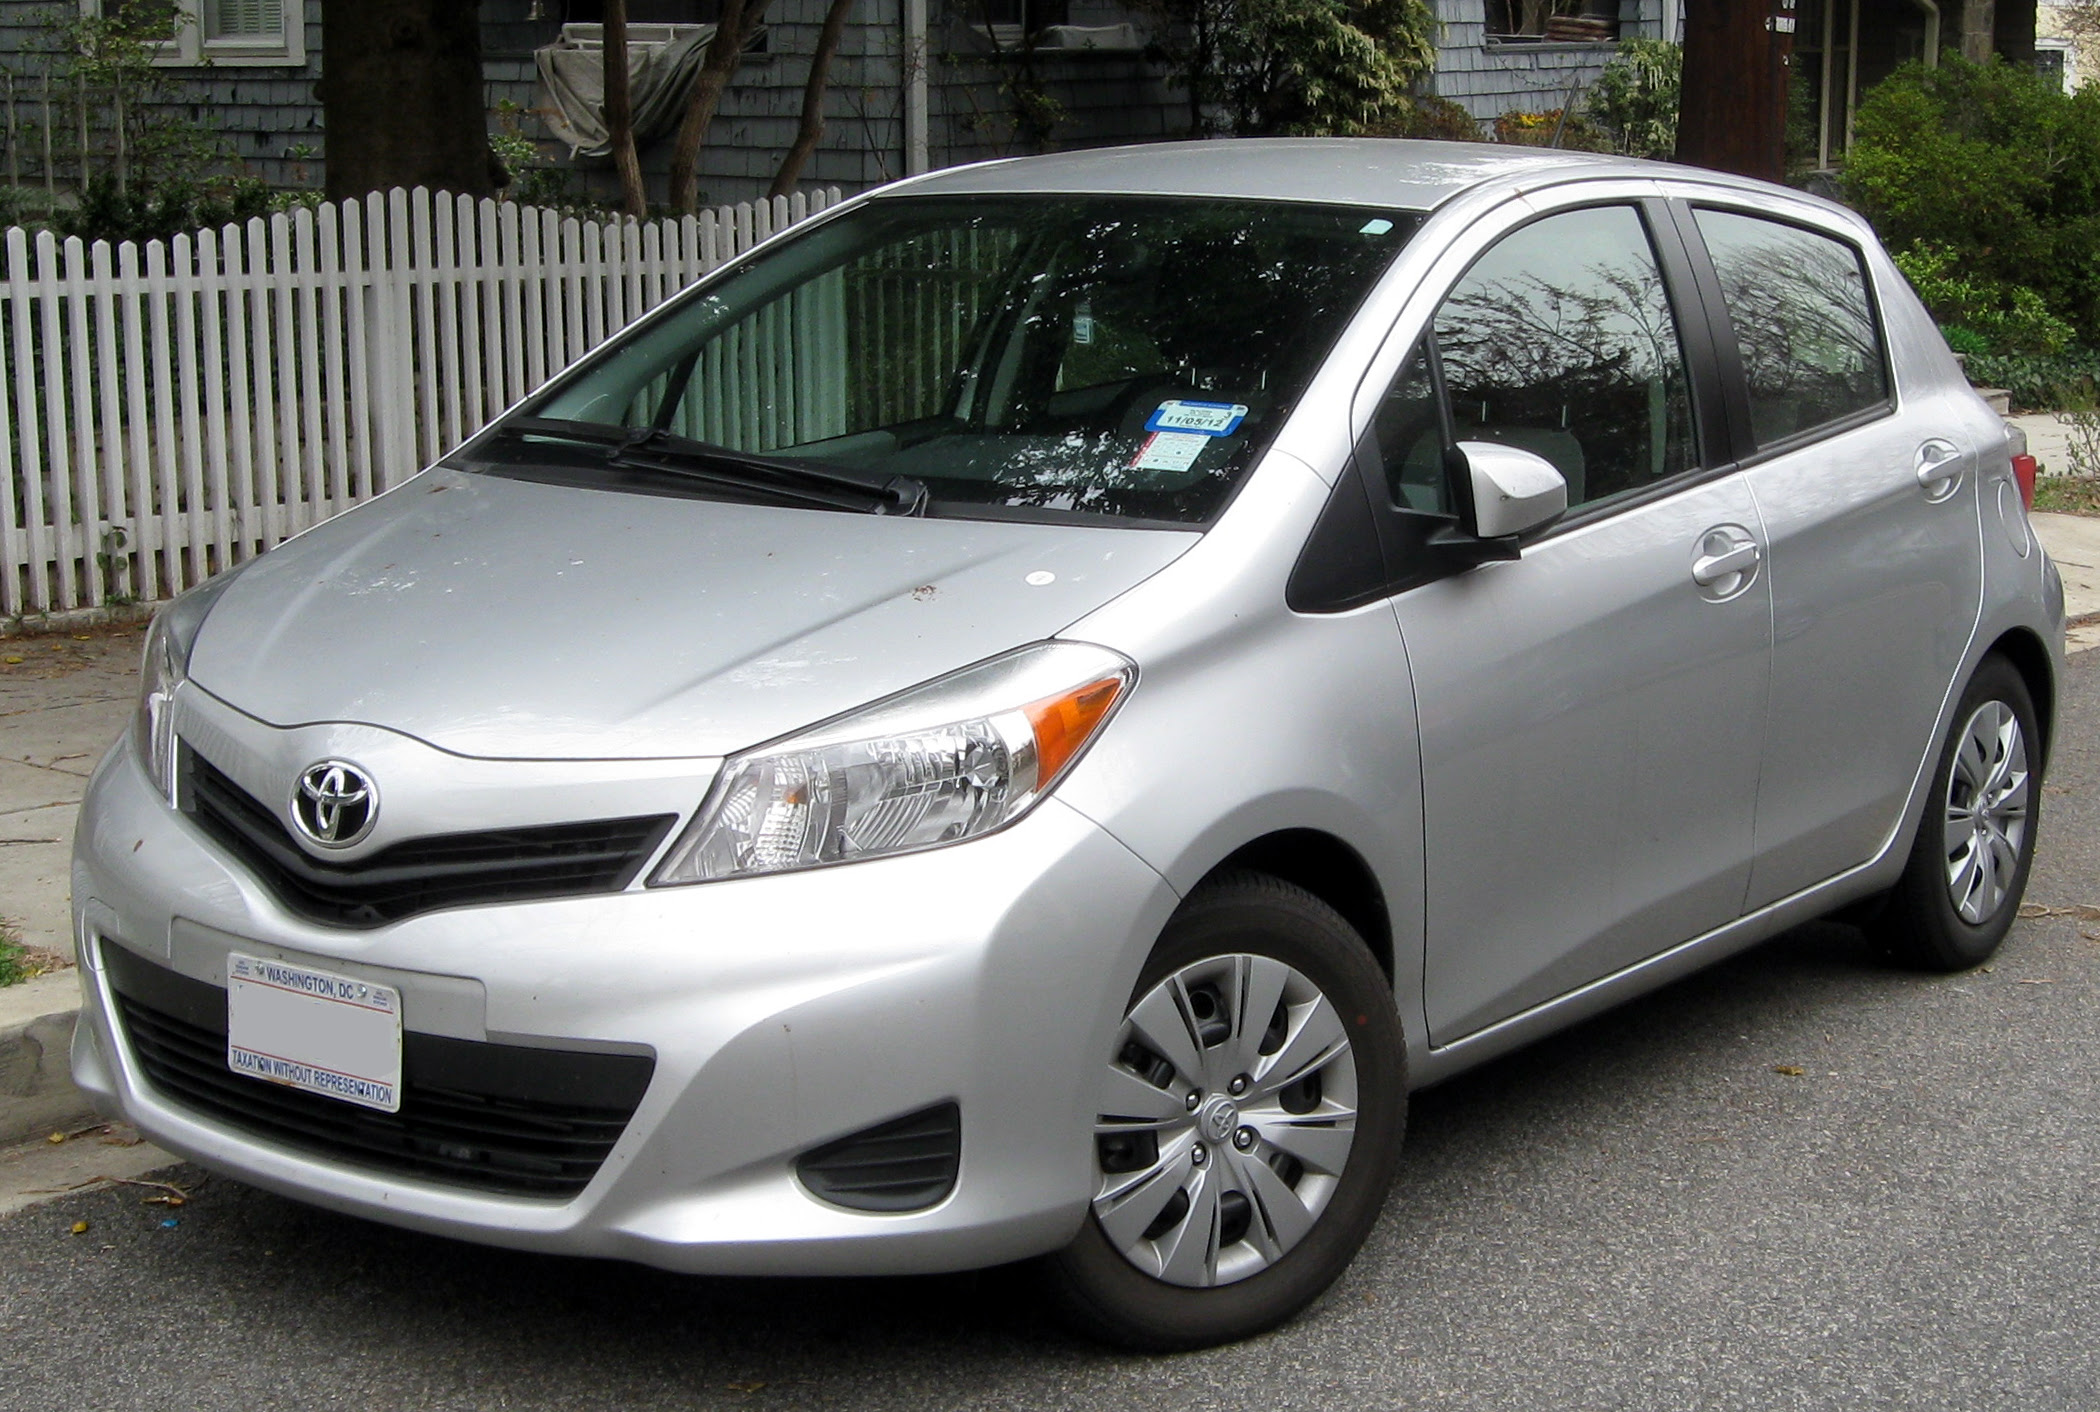 File:2012 Toyota Yaris LE five-door -- 03-16-2012.JPG ...